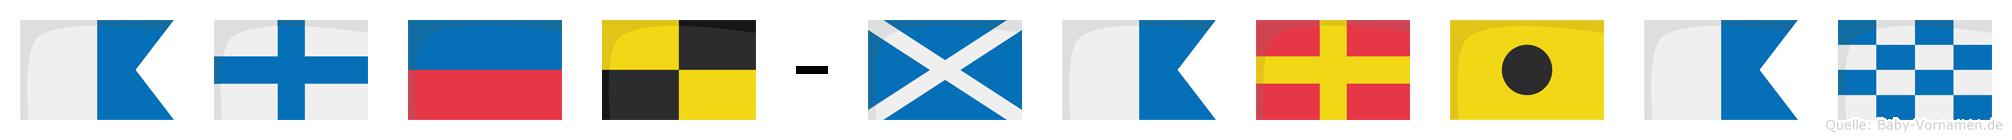 Axel-Marian im Flaggenalphabet